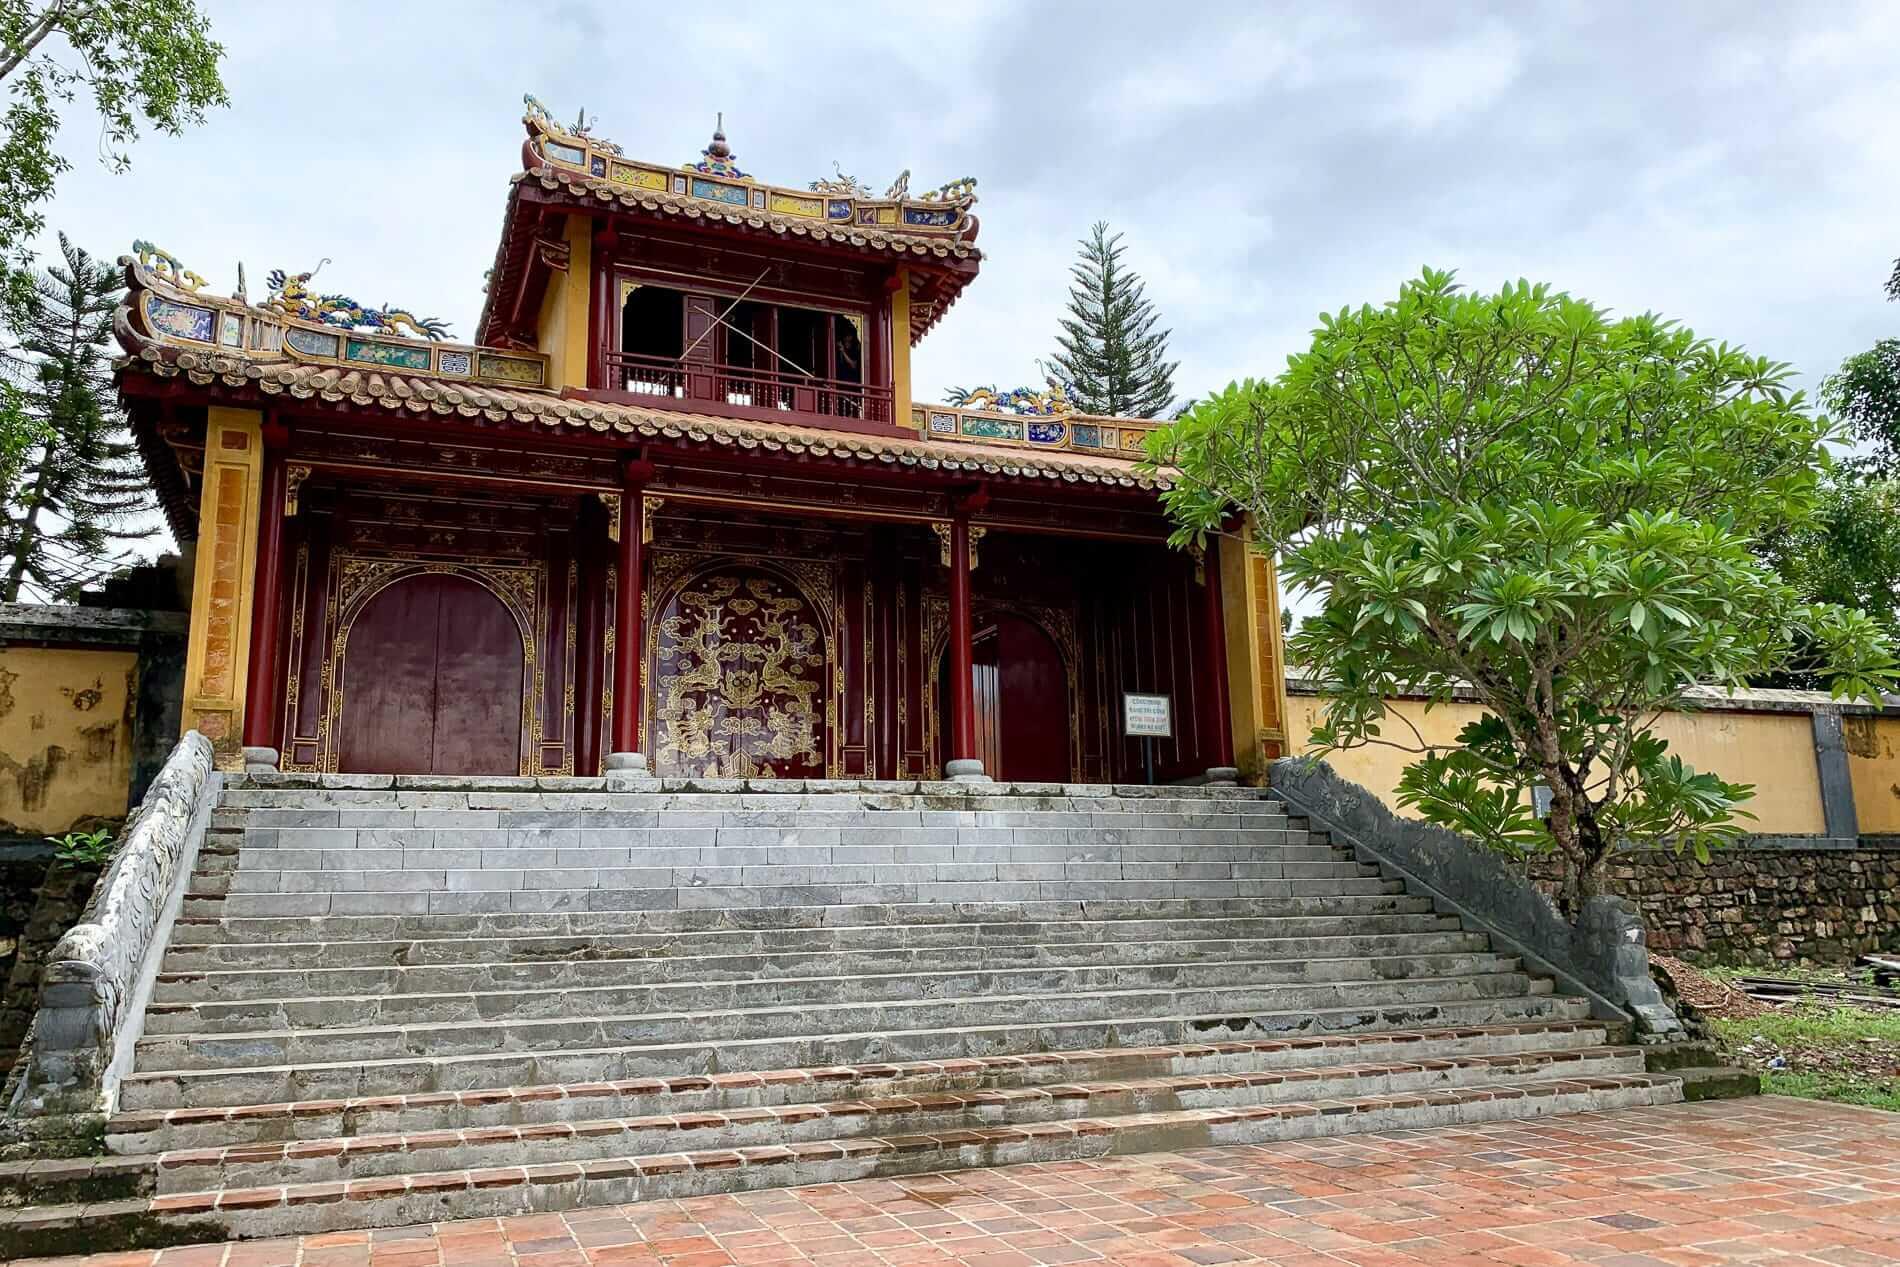 Hue's ancient sites renovation